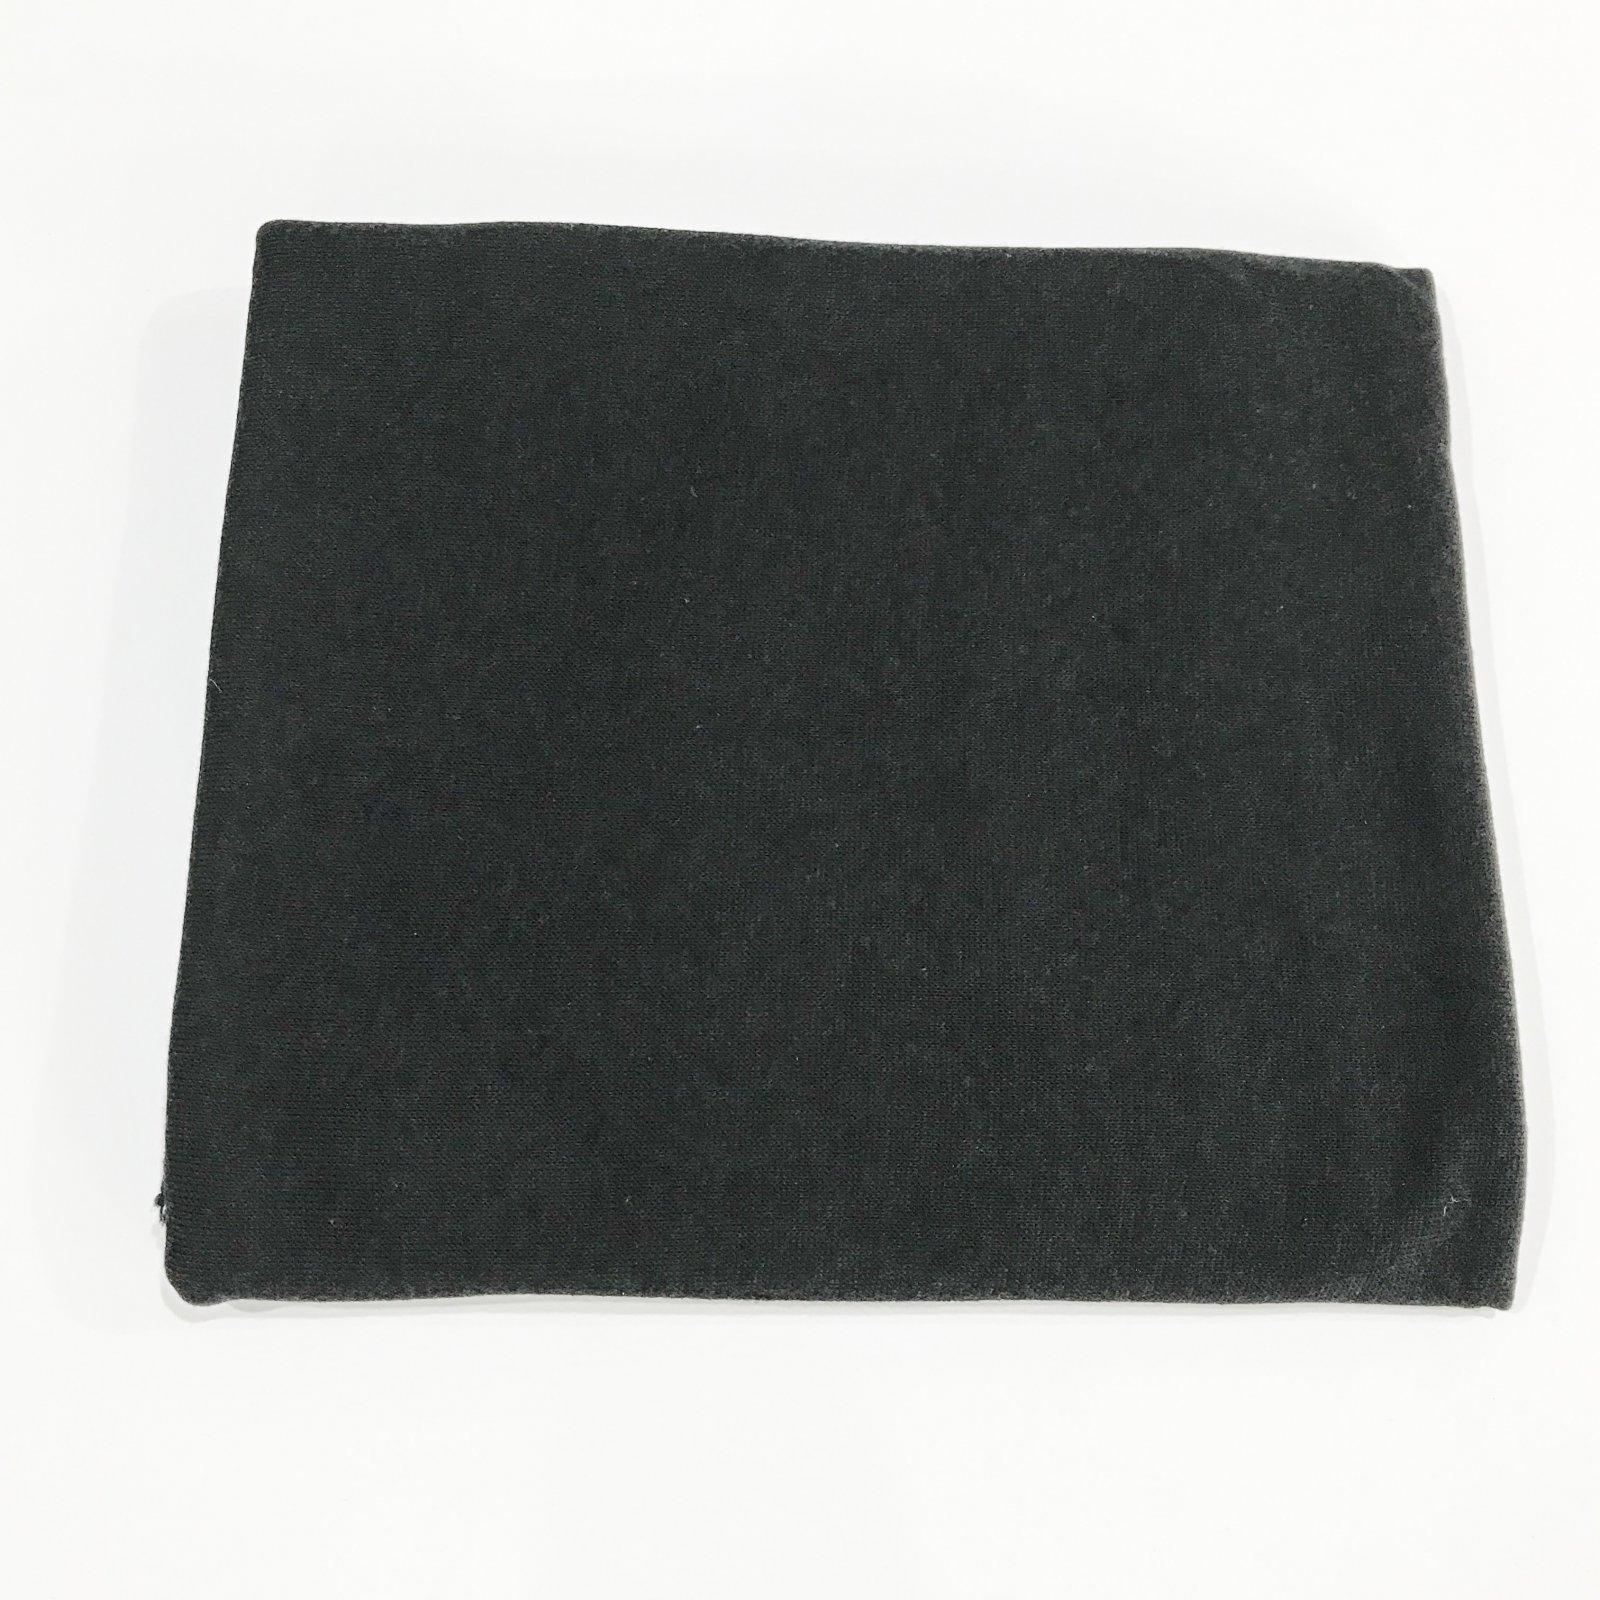 1 1/8 yard - Sweater Knit - Black Knight